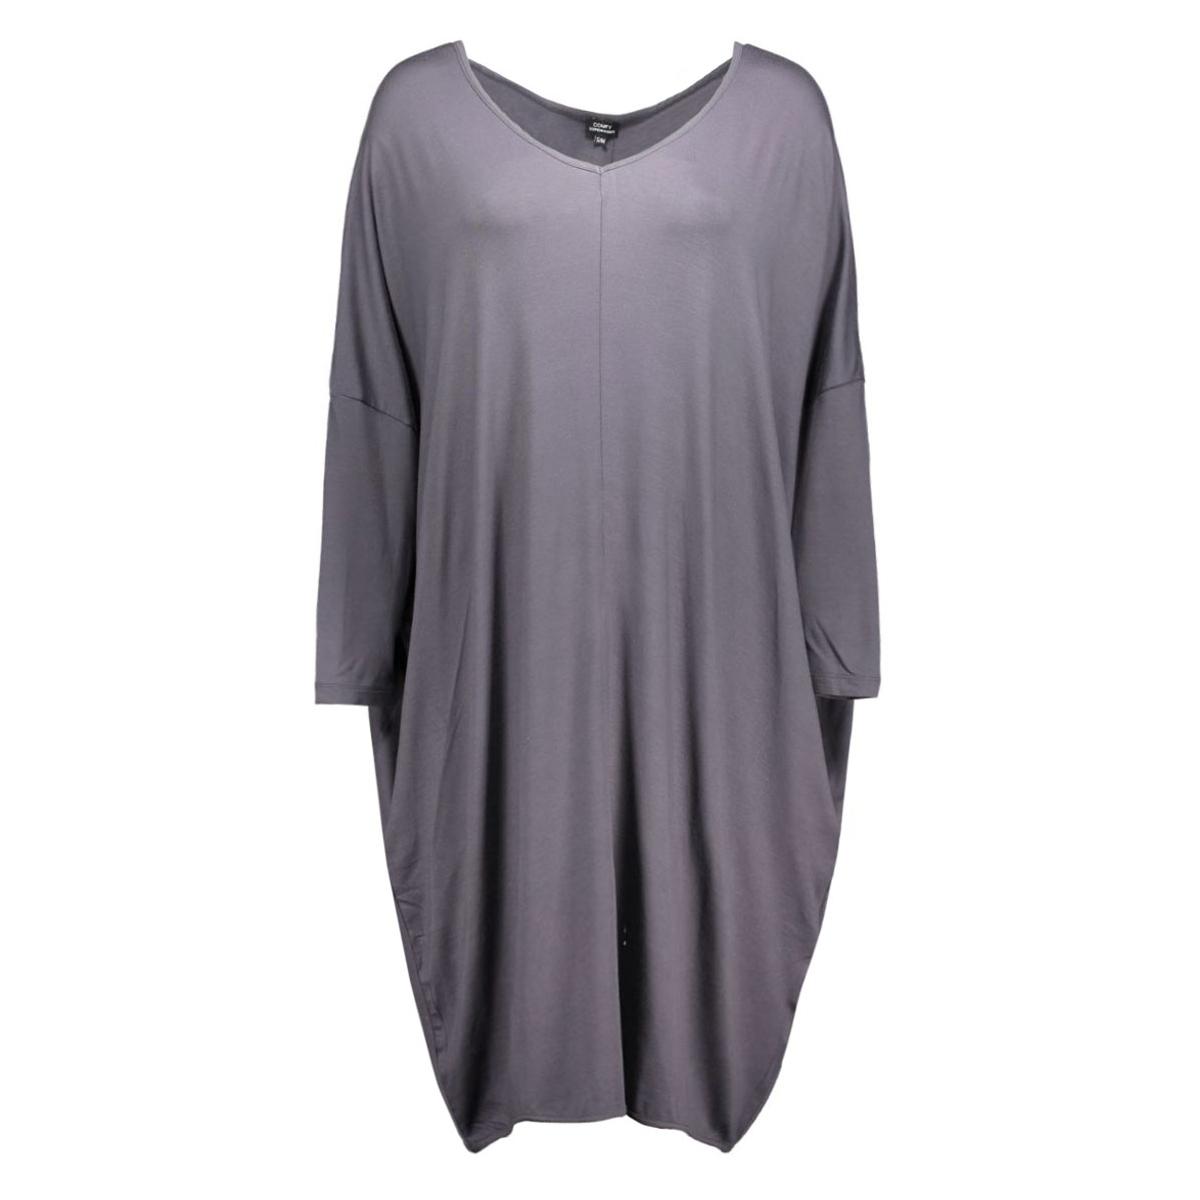 cy1018 comfy copenhagen jurk grijs